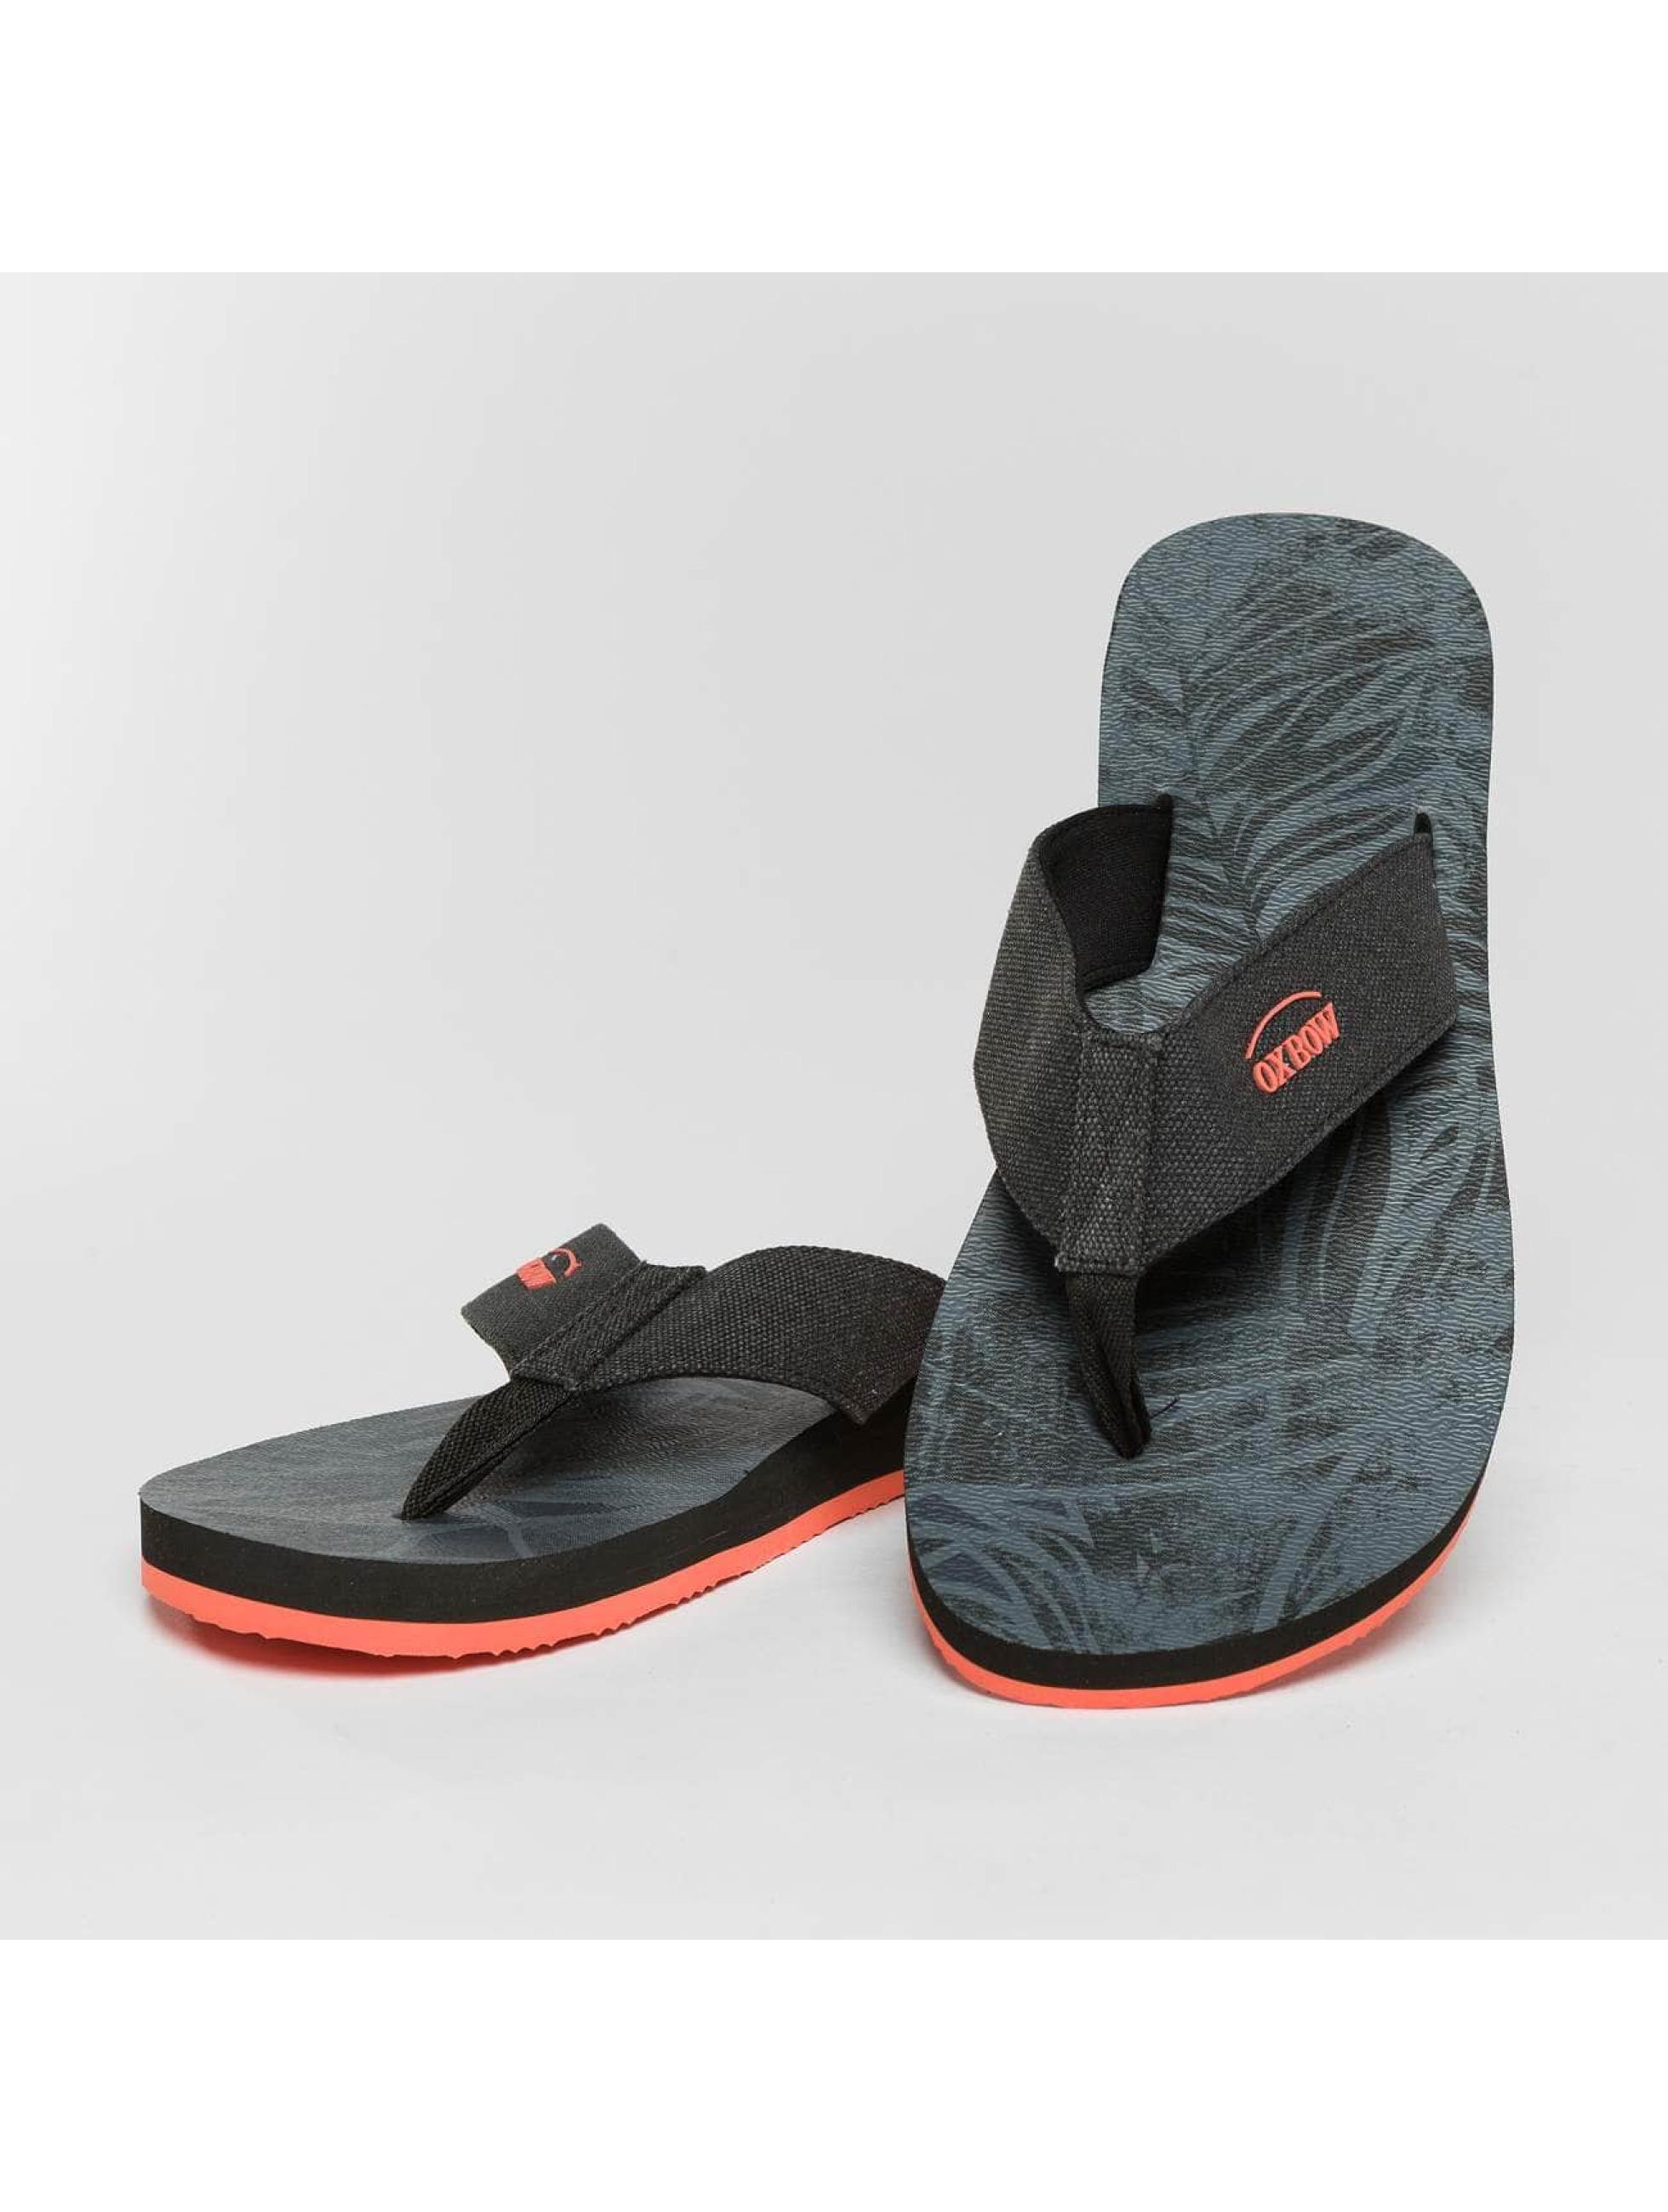 Oxbow Sandals Volcano Printed EVA grey